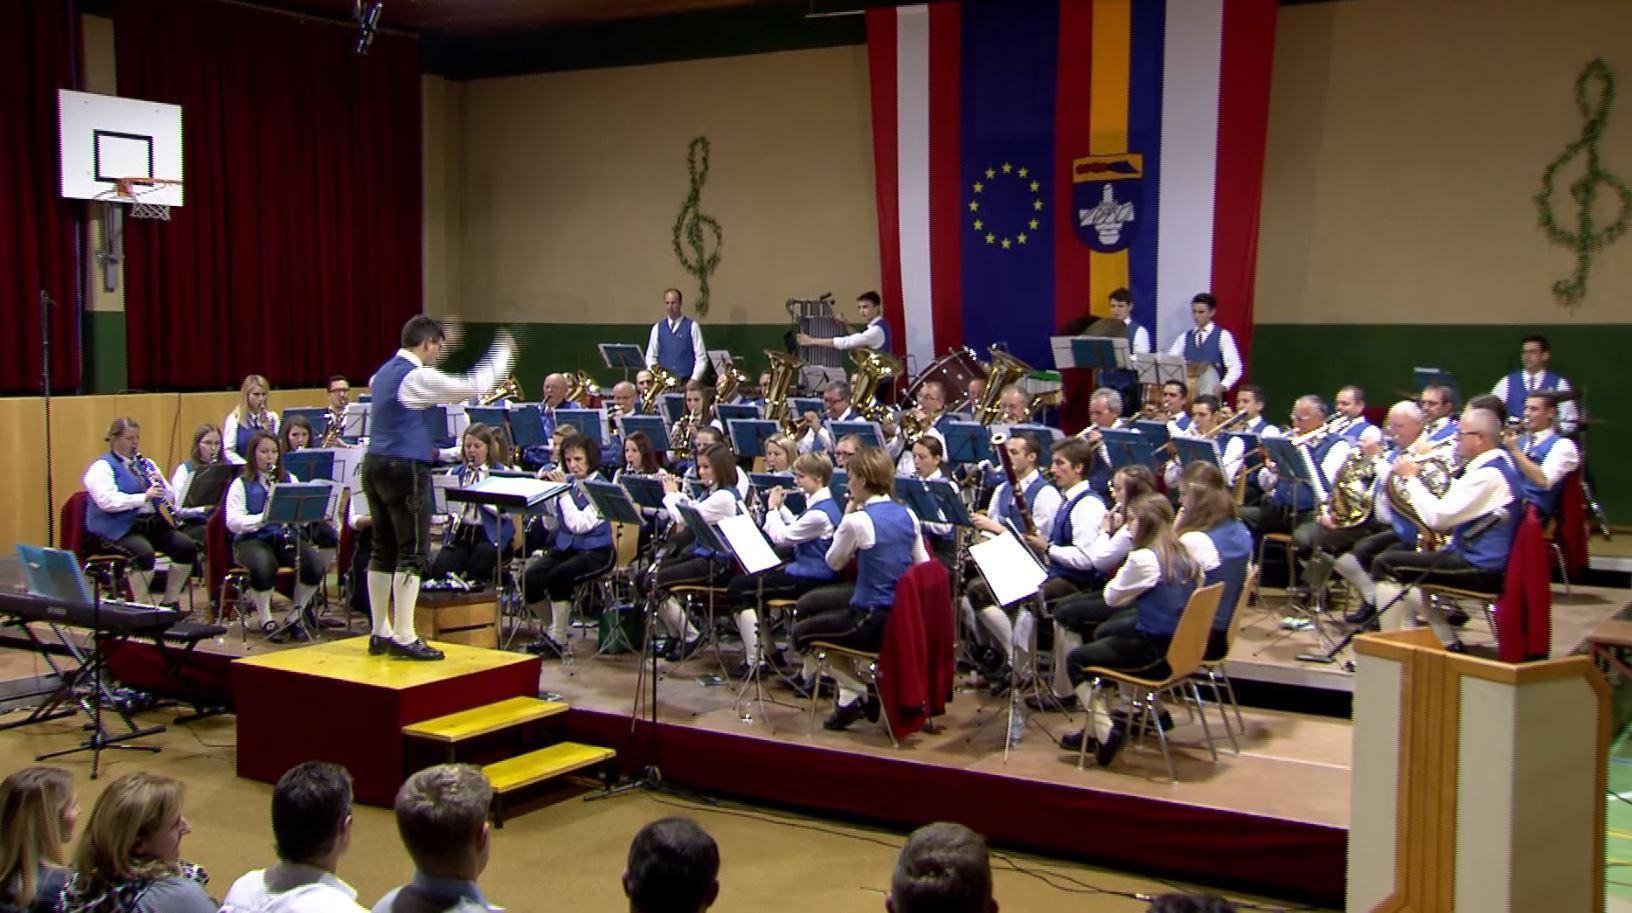 Herbstkonzert Musikverein Ternberg